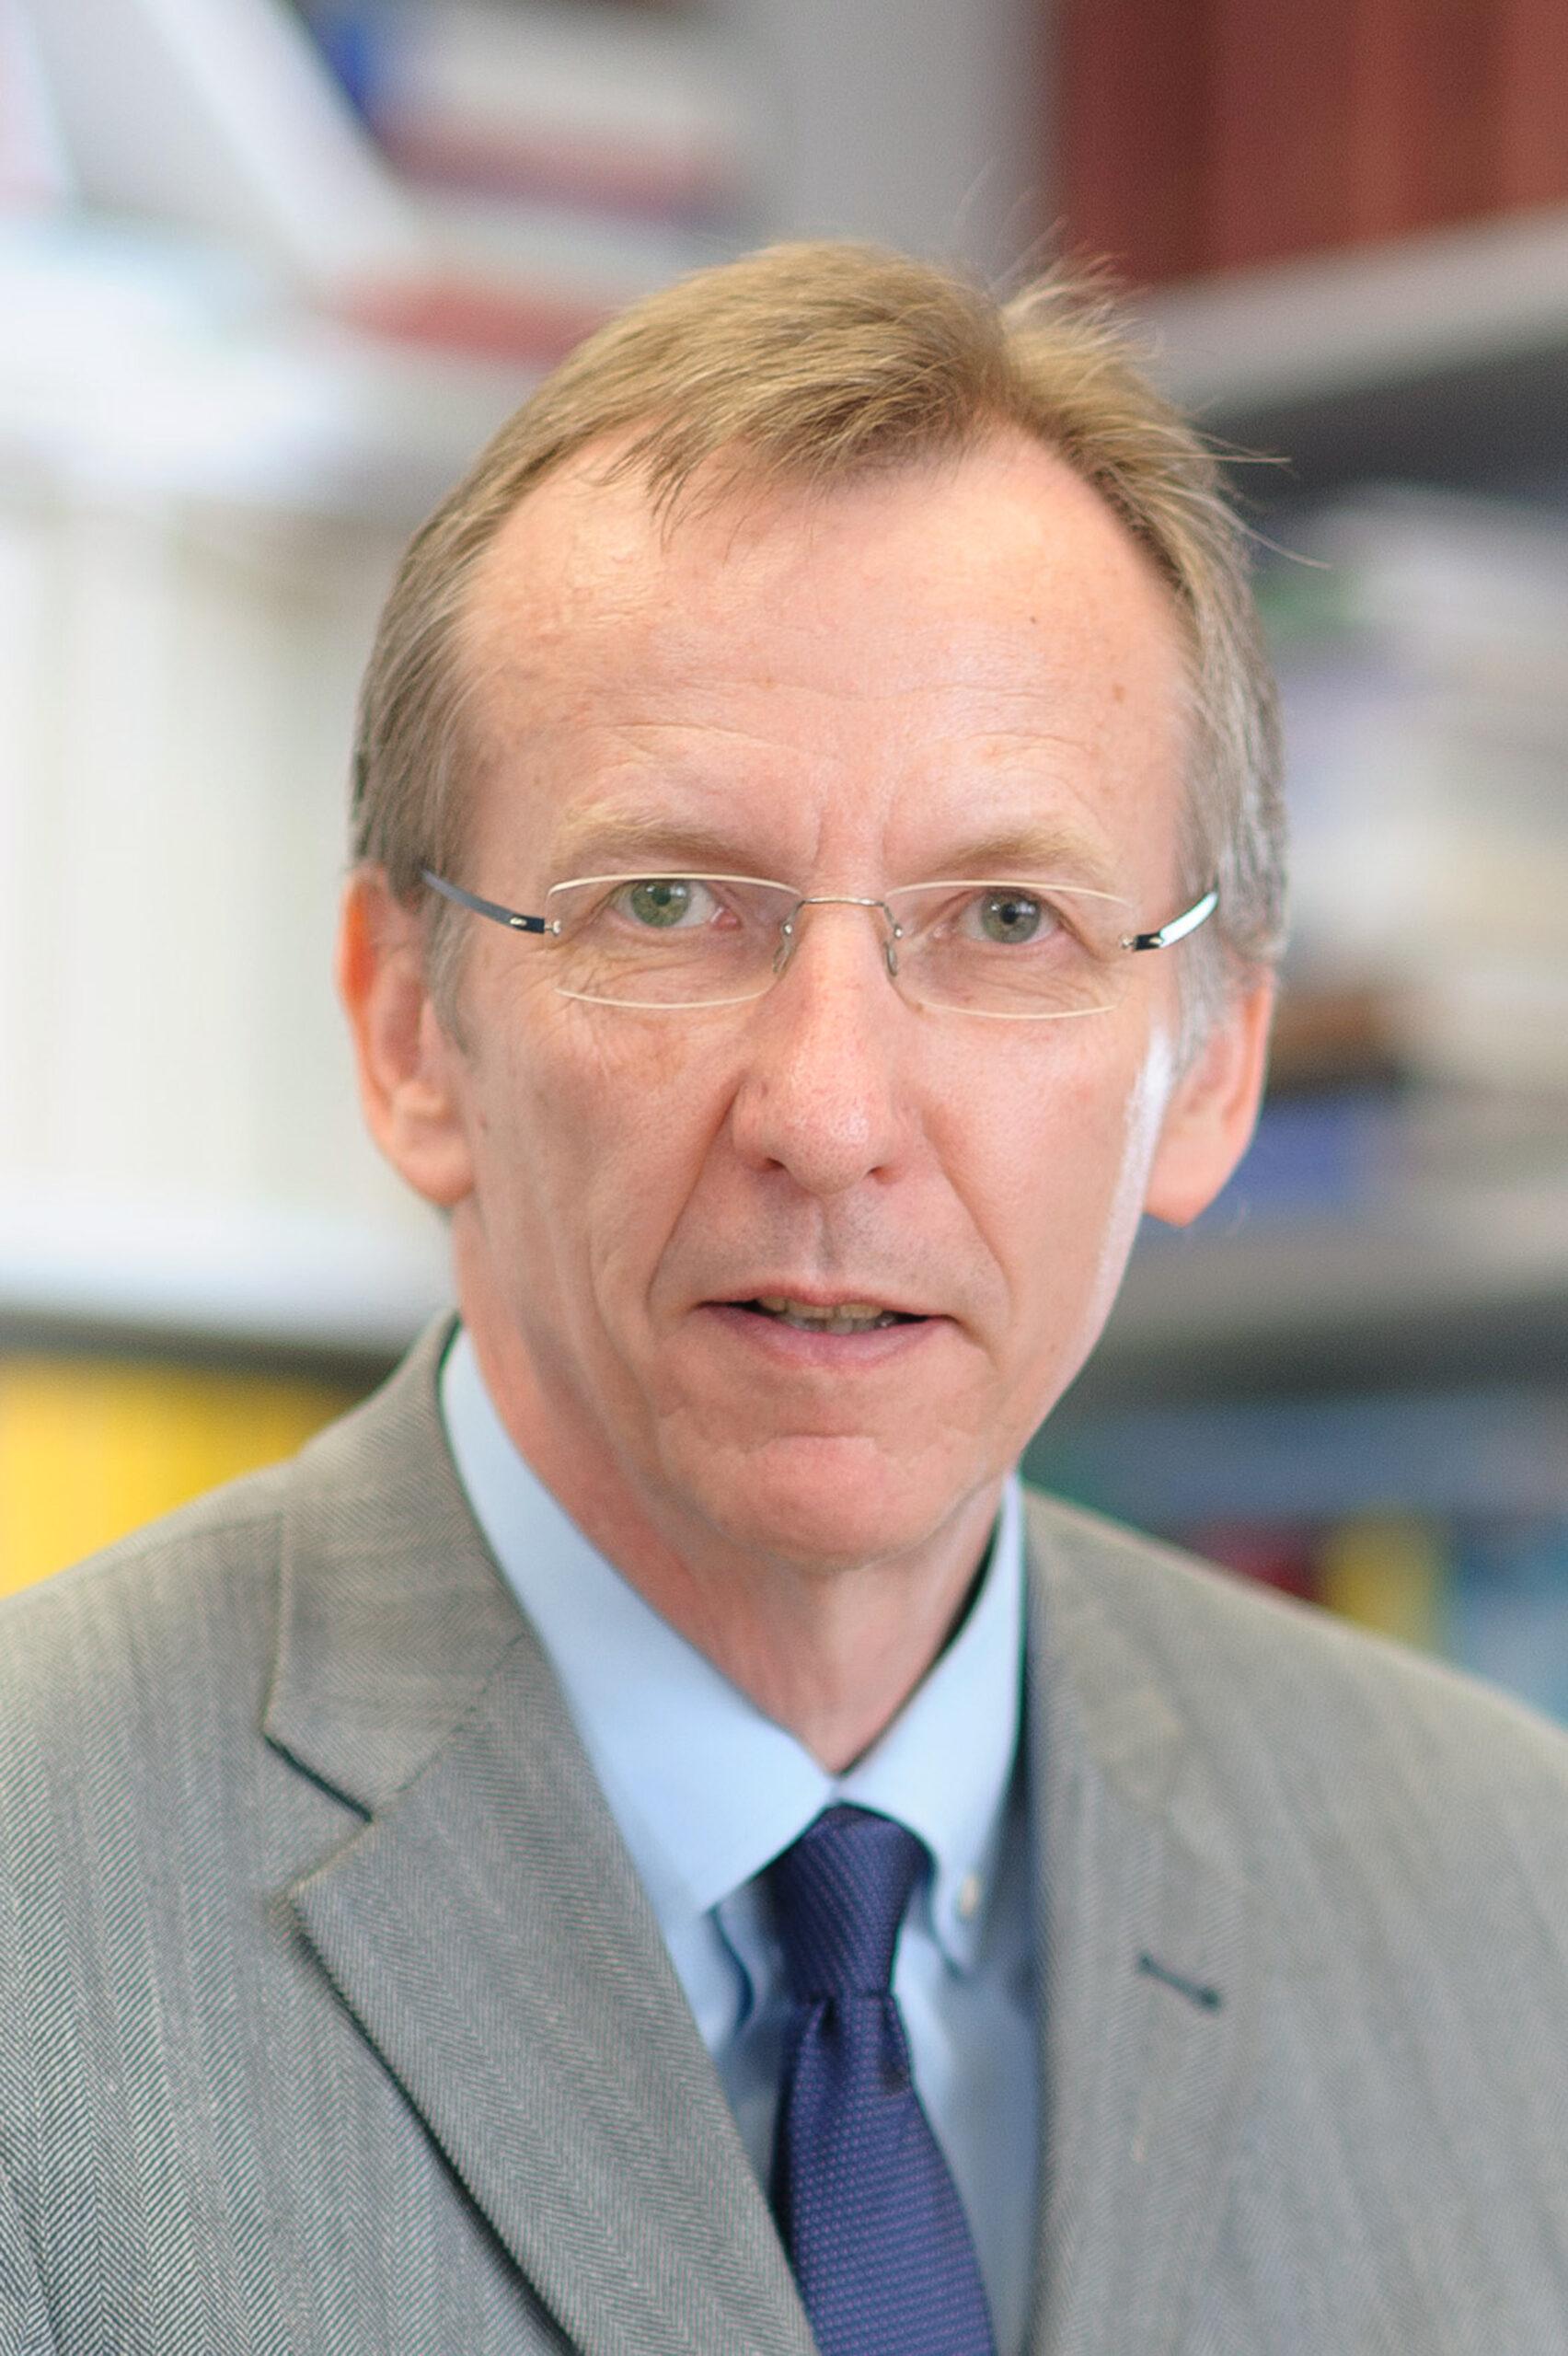 Prof. em. Werner Pascha